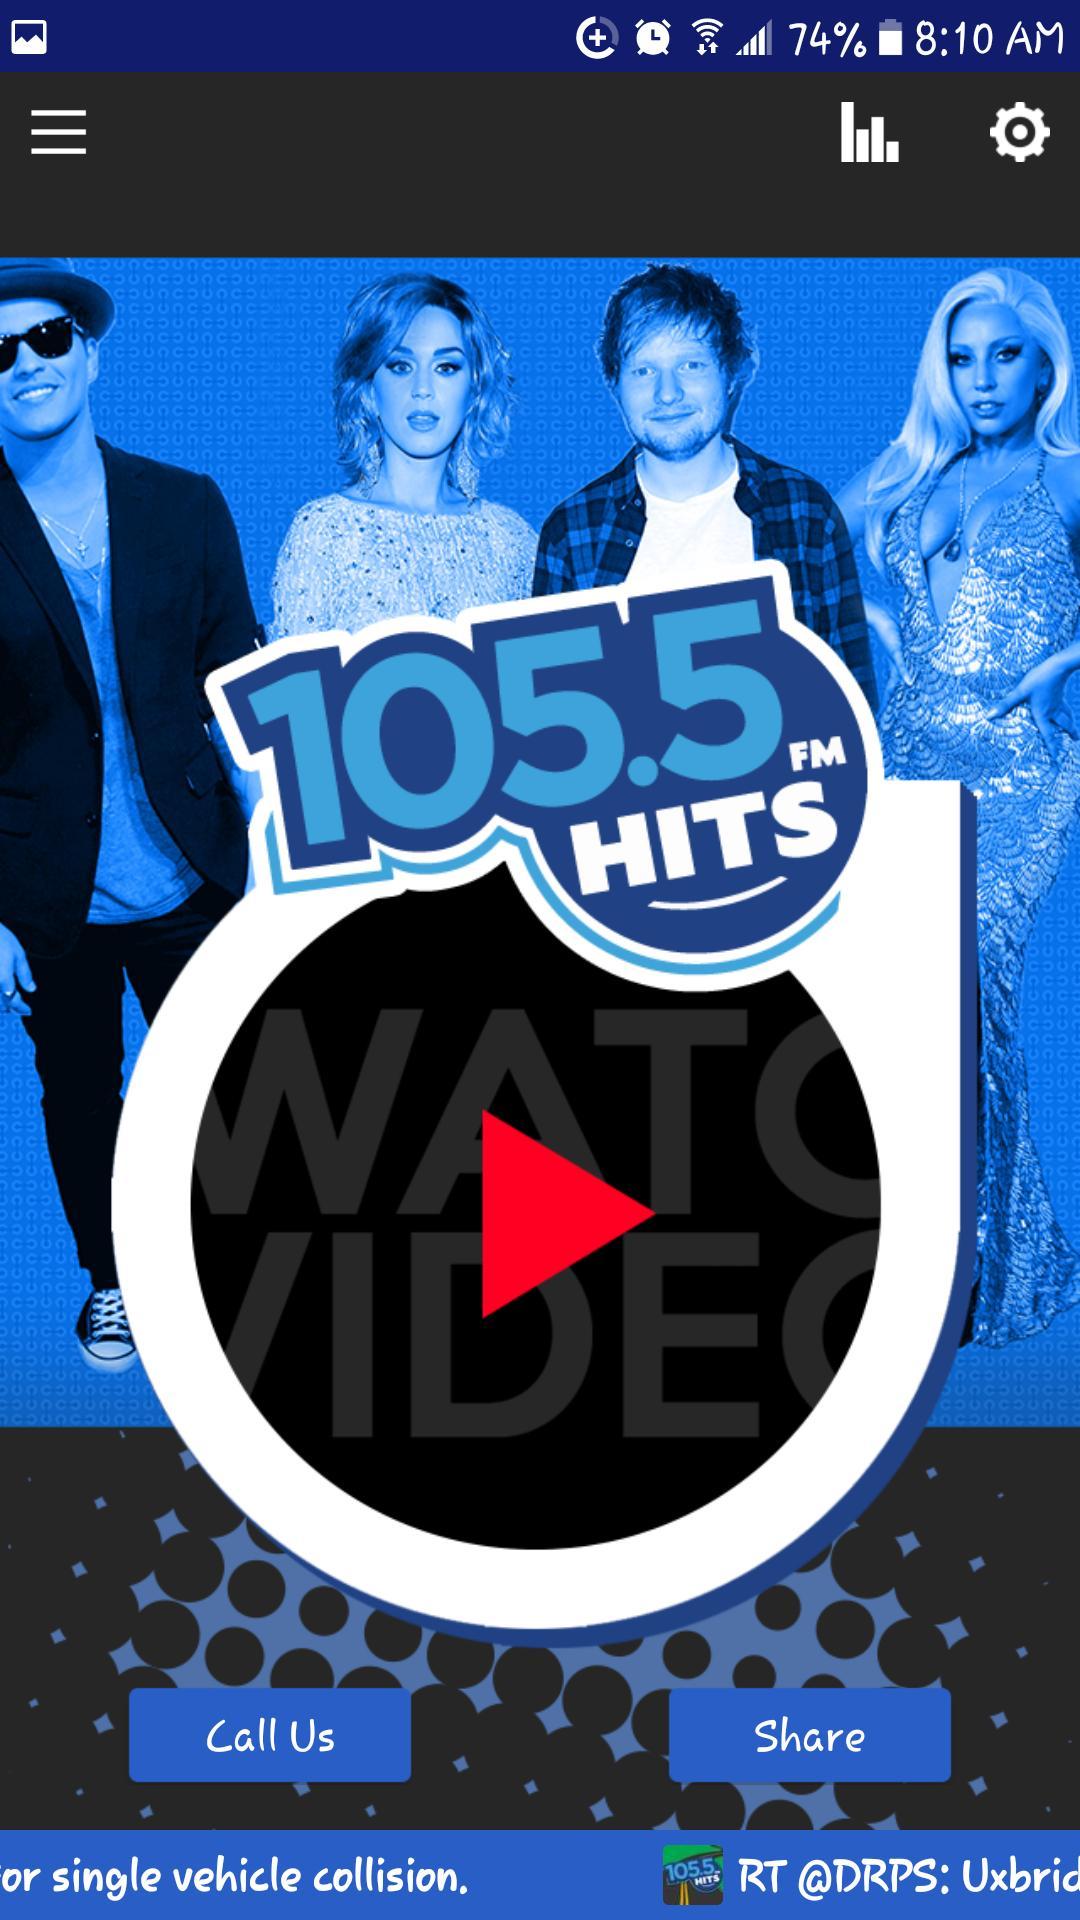 105.5 Hits FM. The Voice of Uxbridge poster